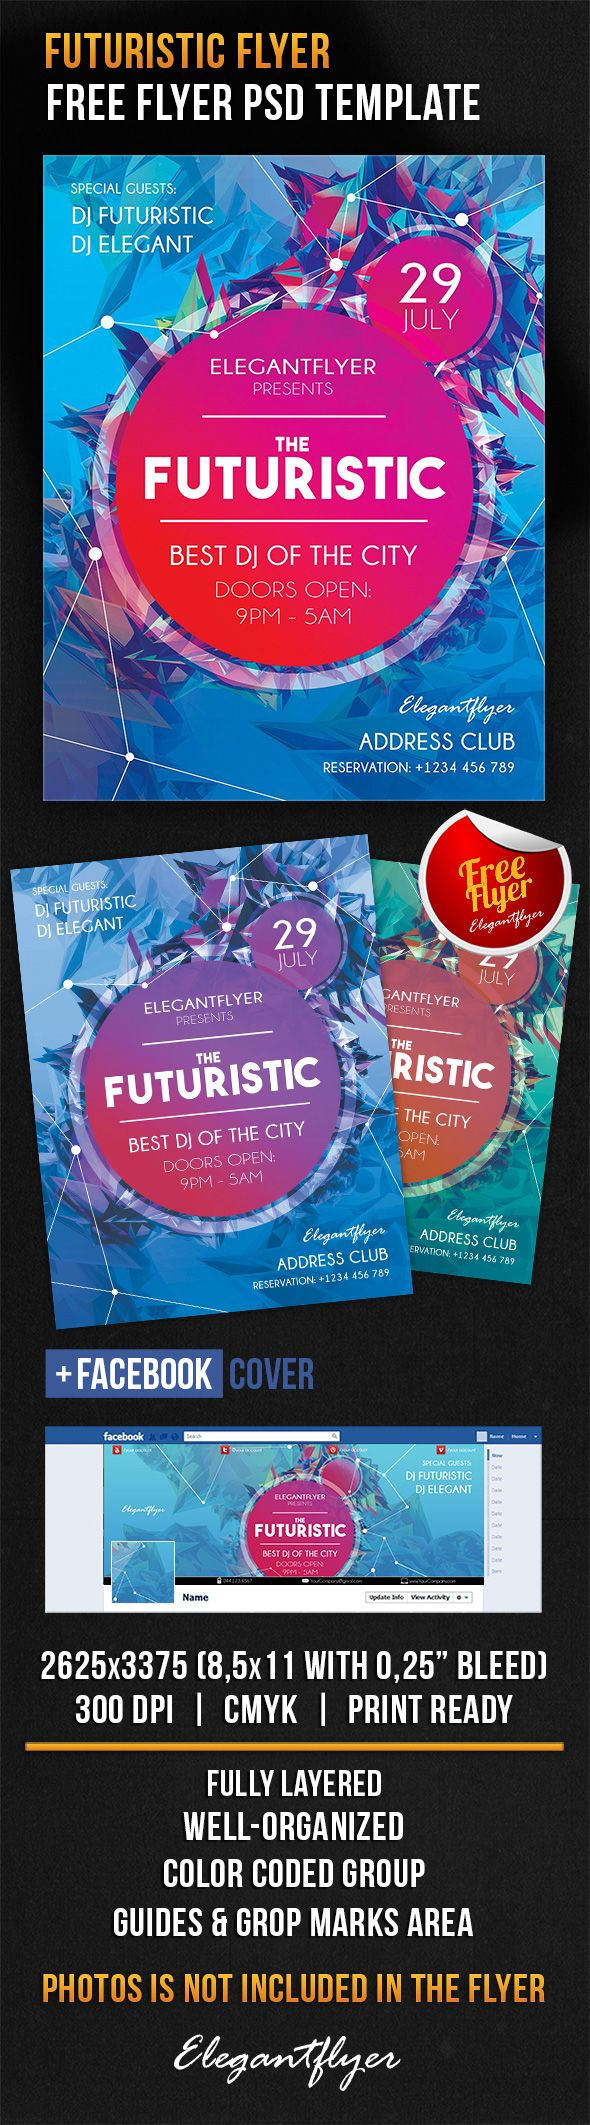 Futuristic Flyer – Free Flyer PSD Template + Facebook Cover https://www.elegantflyer.com/free-flyers/futuristic-flyer-free-flyer-psd-template-facebook-cover/